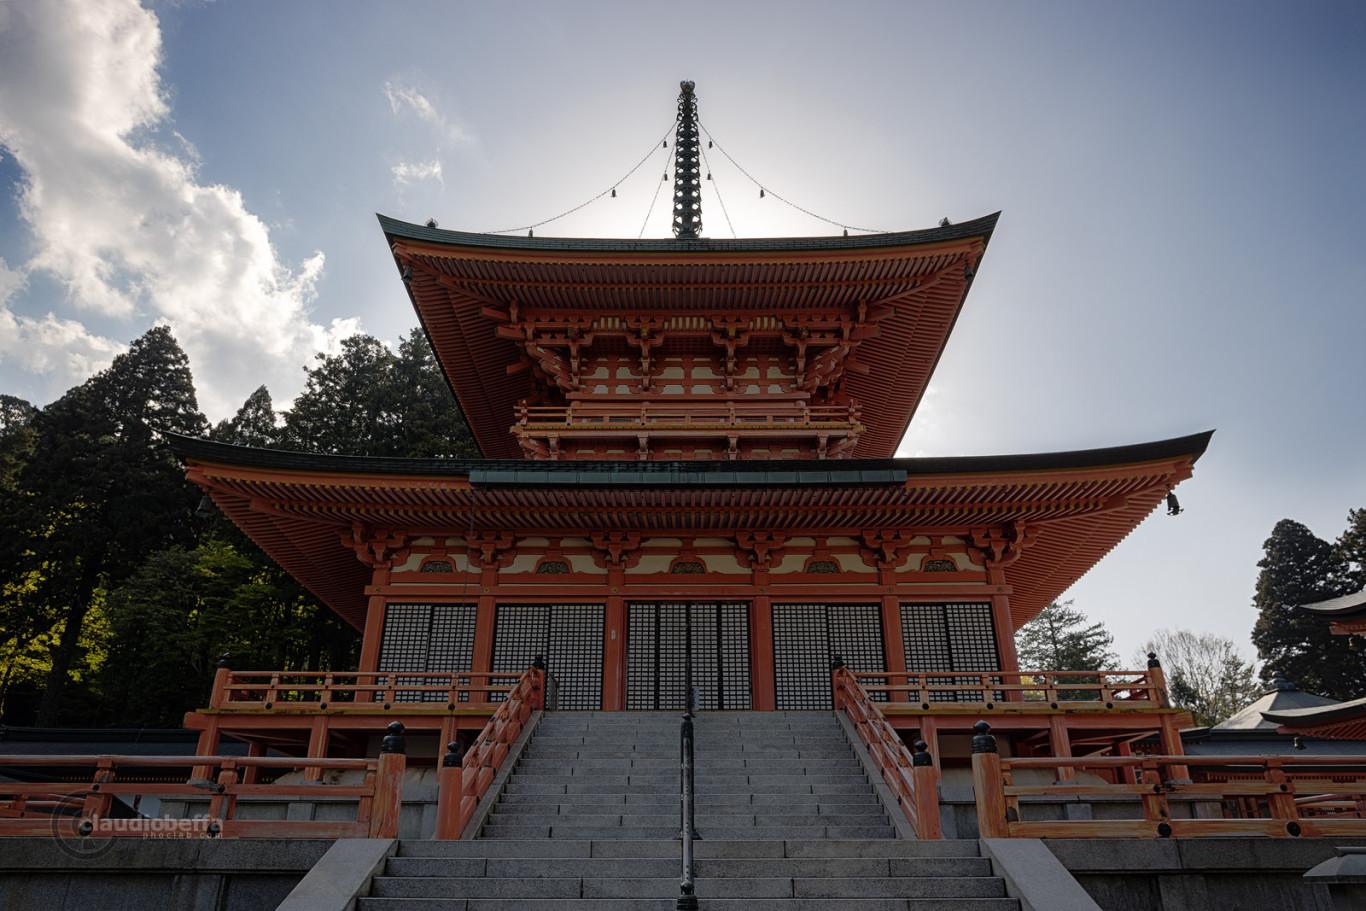 Hiei, Hieizan, Mountain, To-do, Temple, Buddhism, Tower, Pagoda, Light, Japan, Pentax